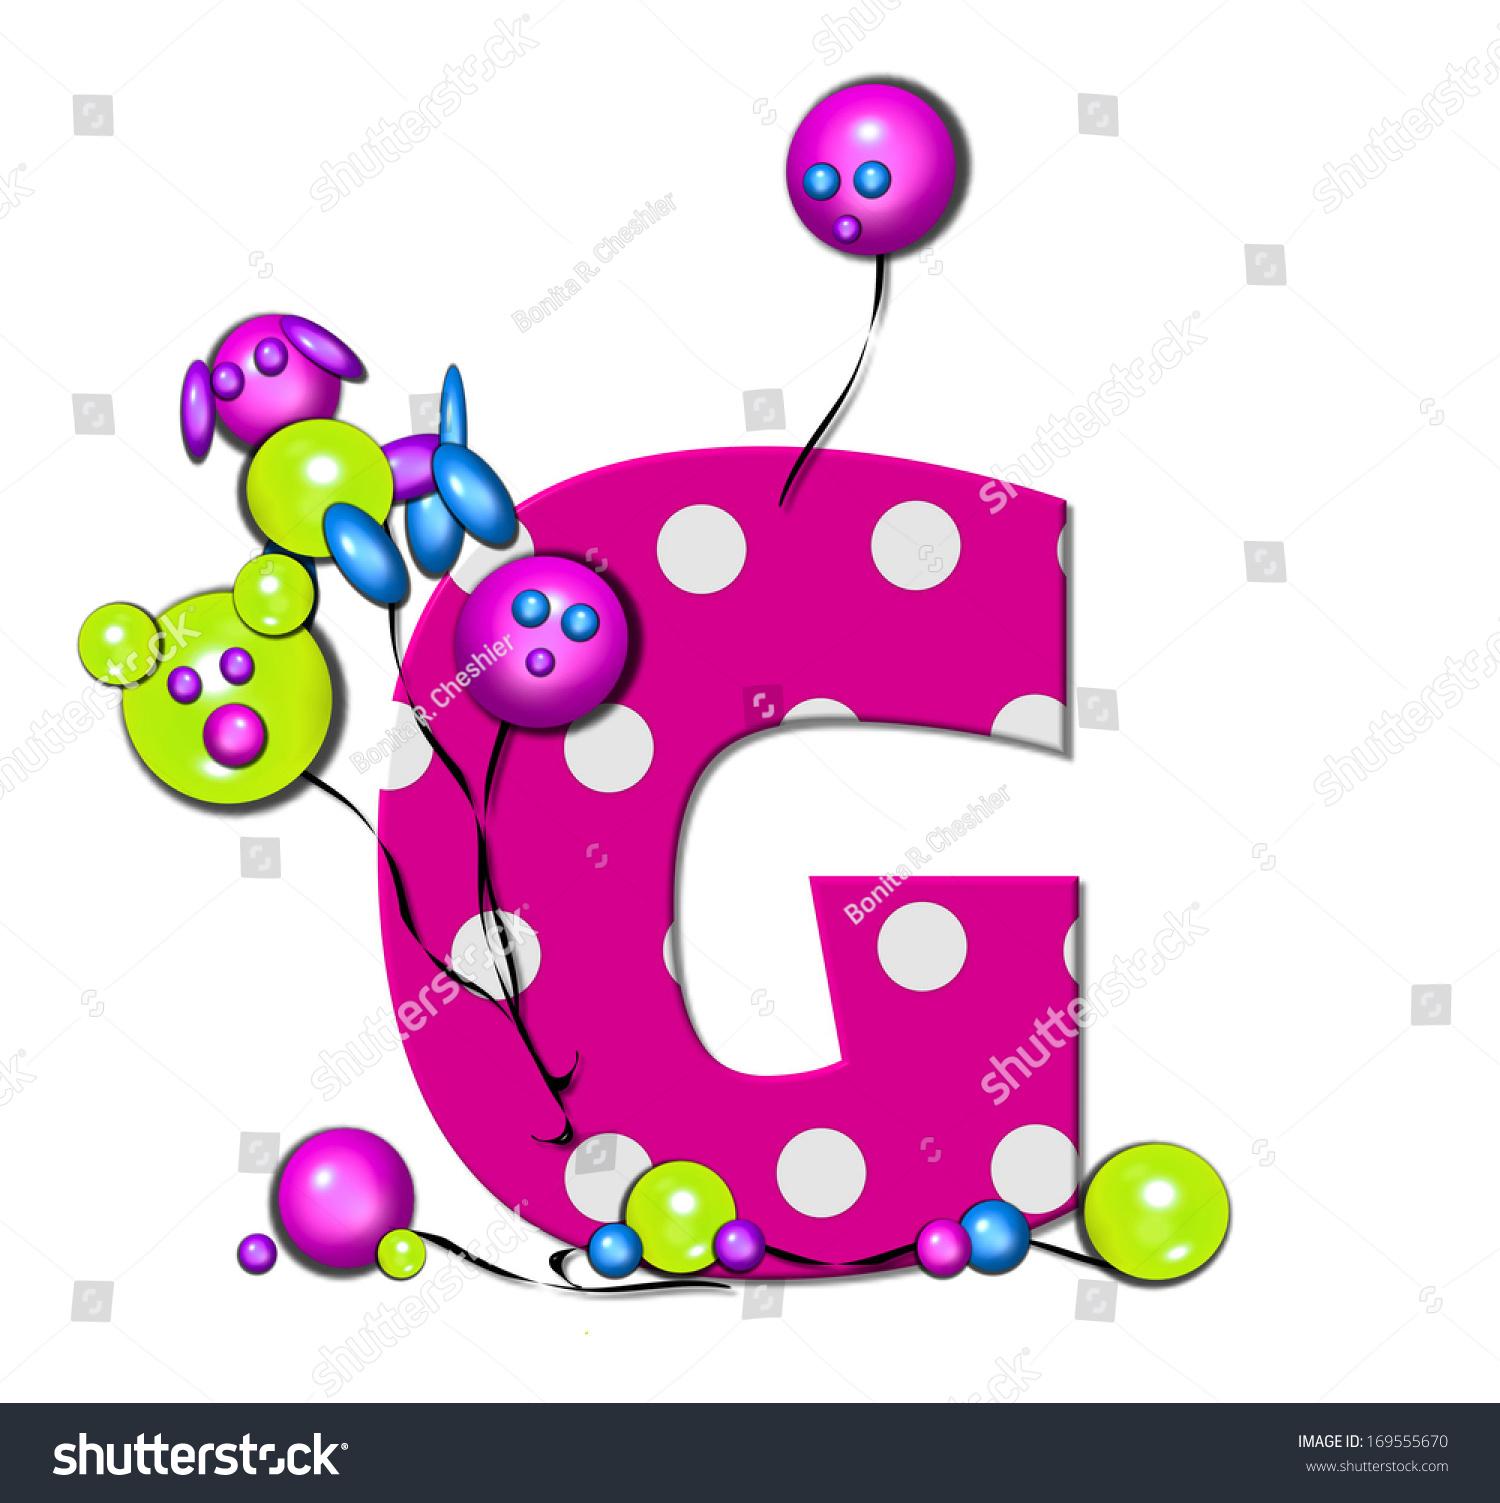 Letter G Alphabet Set Party Balloons Stock Illustration 169555670 ...